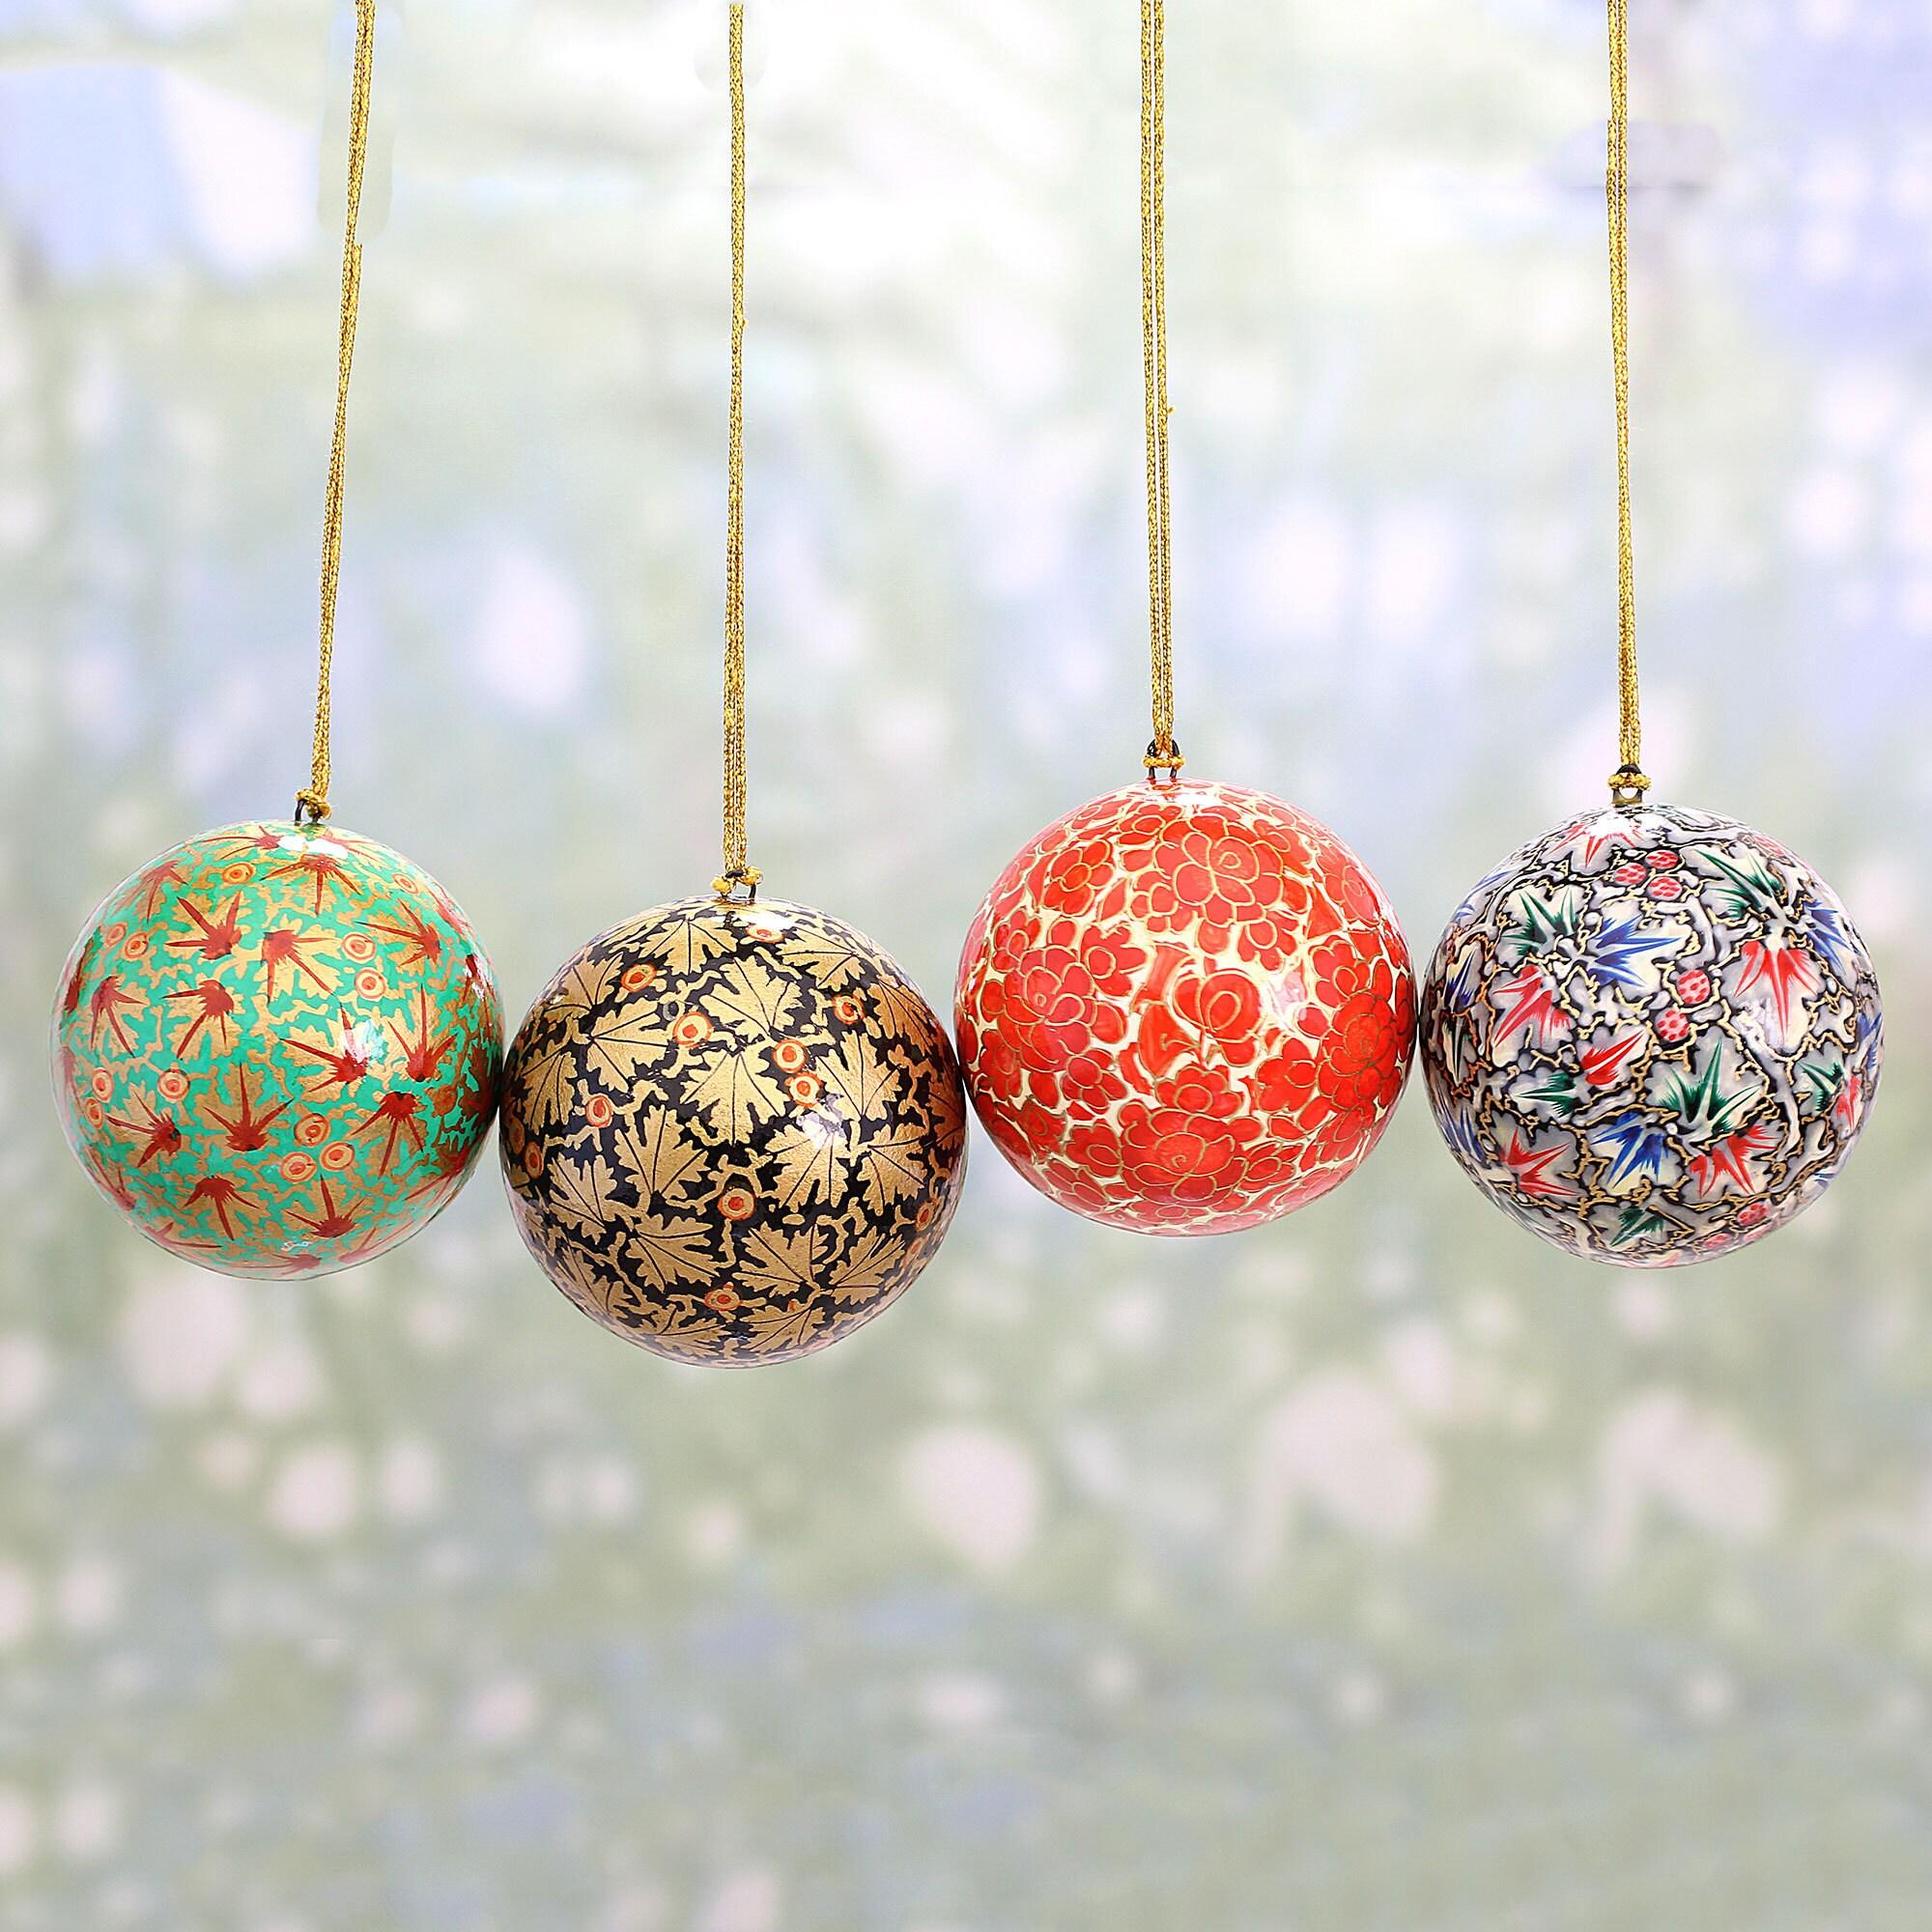 Paper Mache Christmas Ornament.Handmade Alluring Baubles Paper Mache Ornament Set Of 4 India